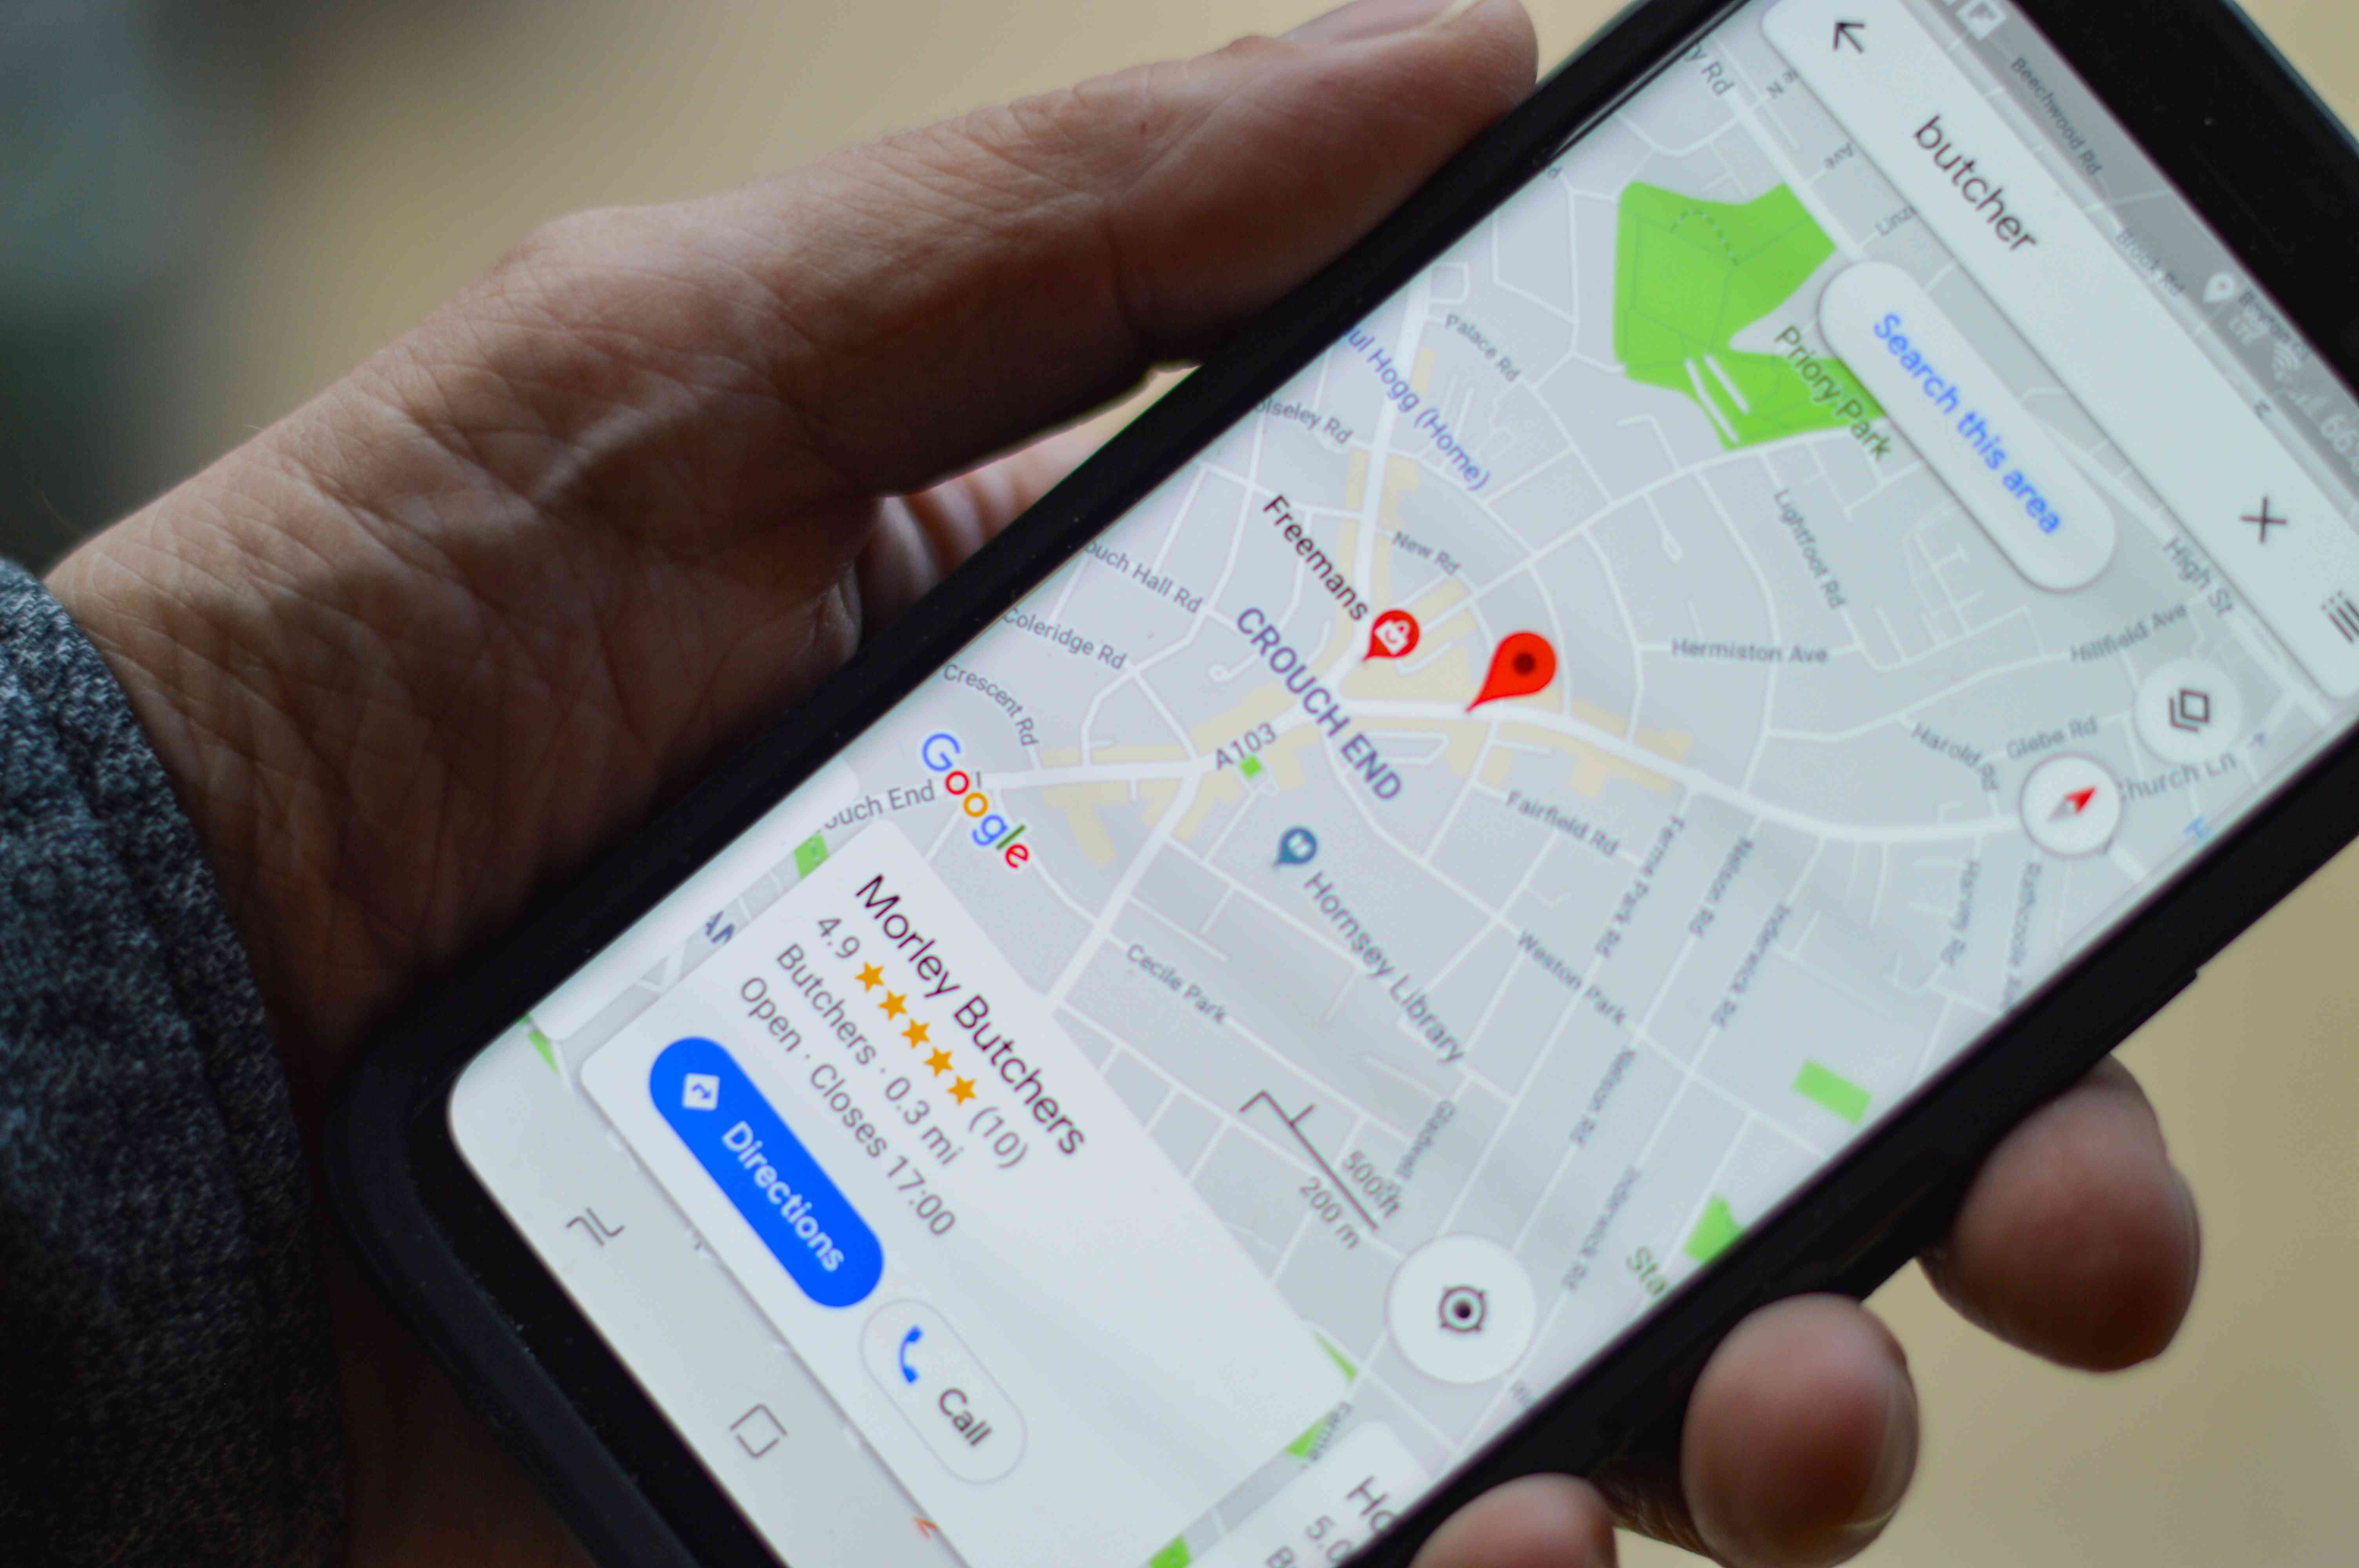 Google Maps on smartphone held in hand